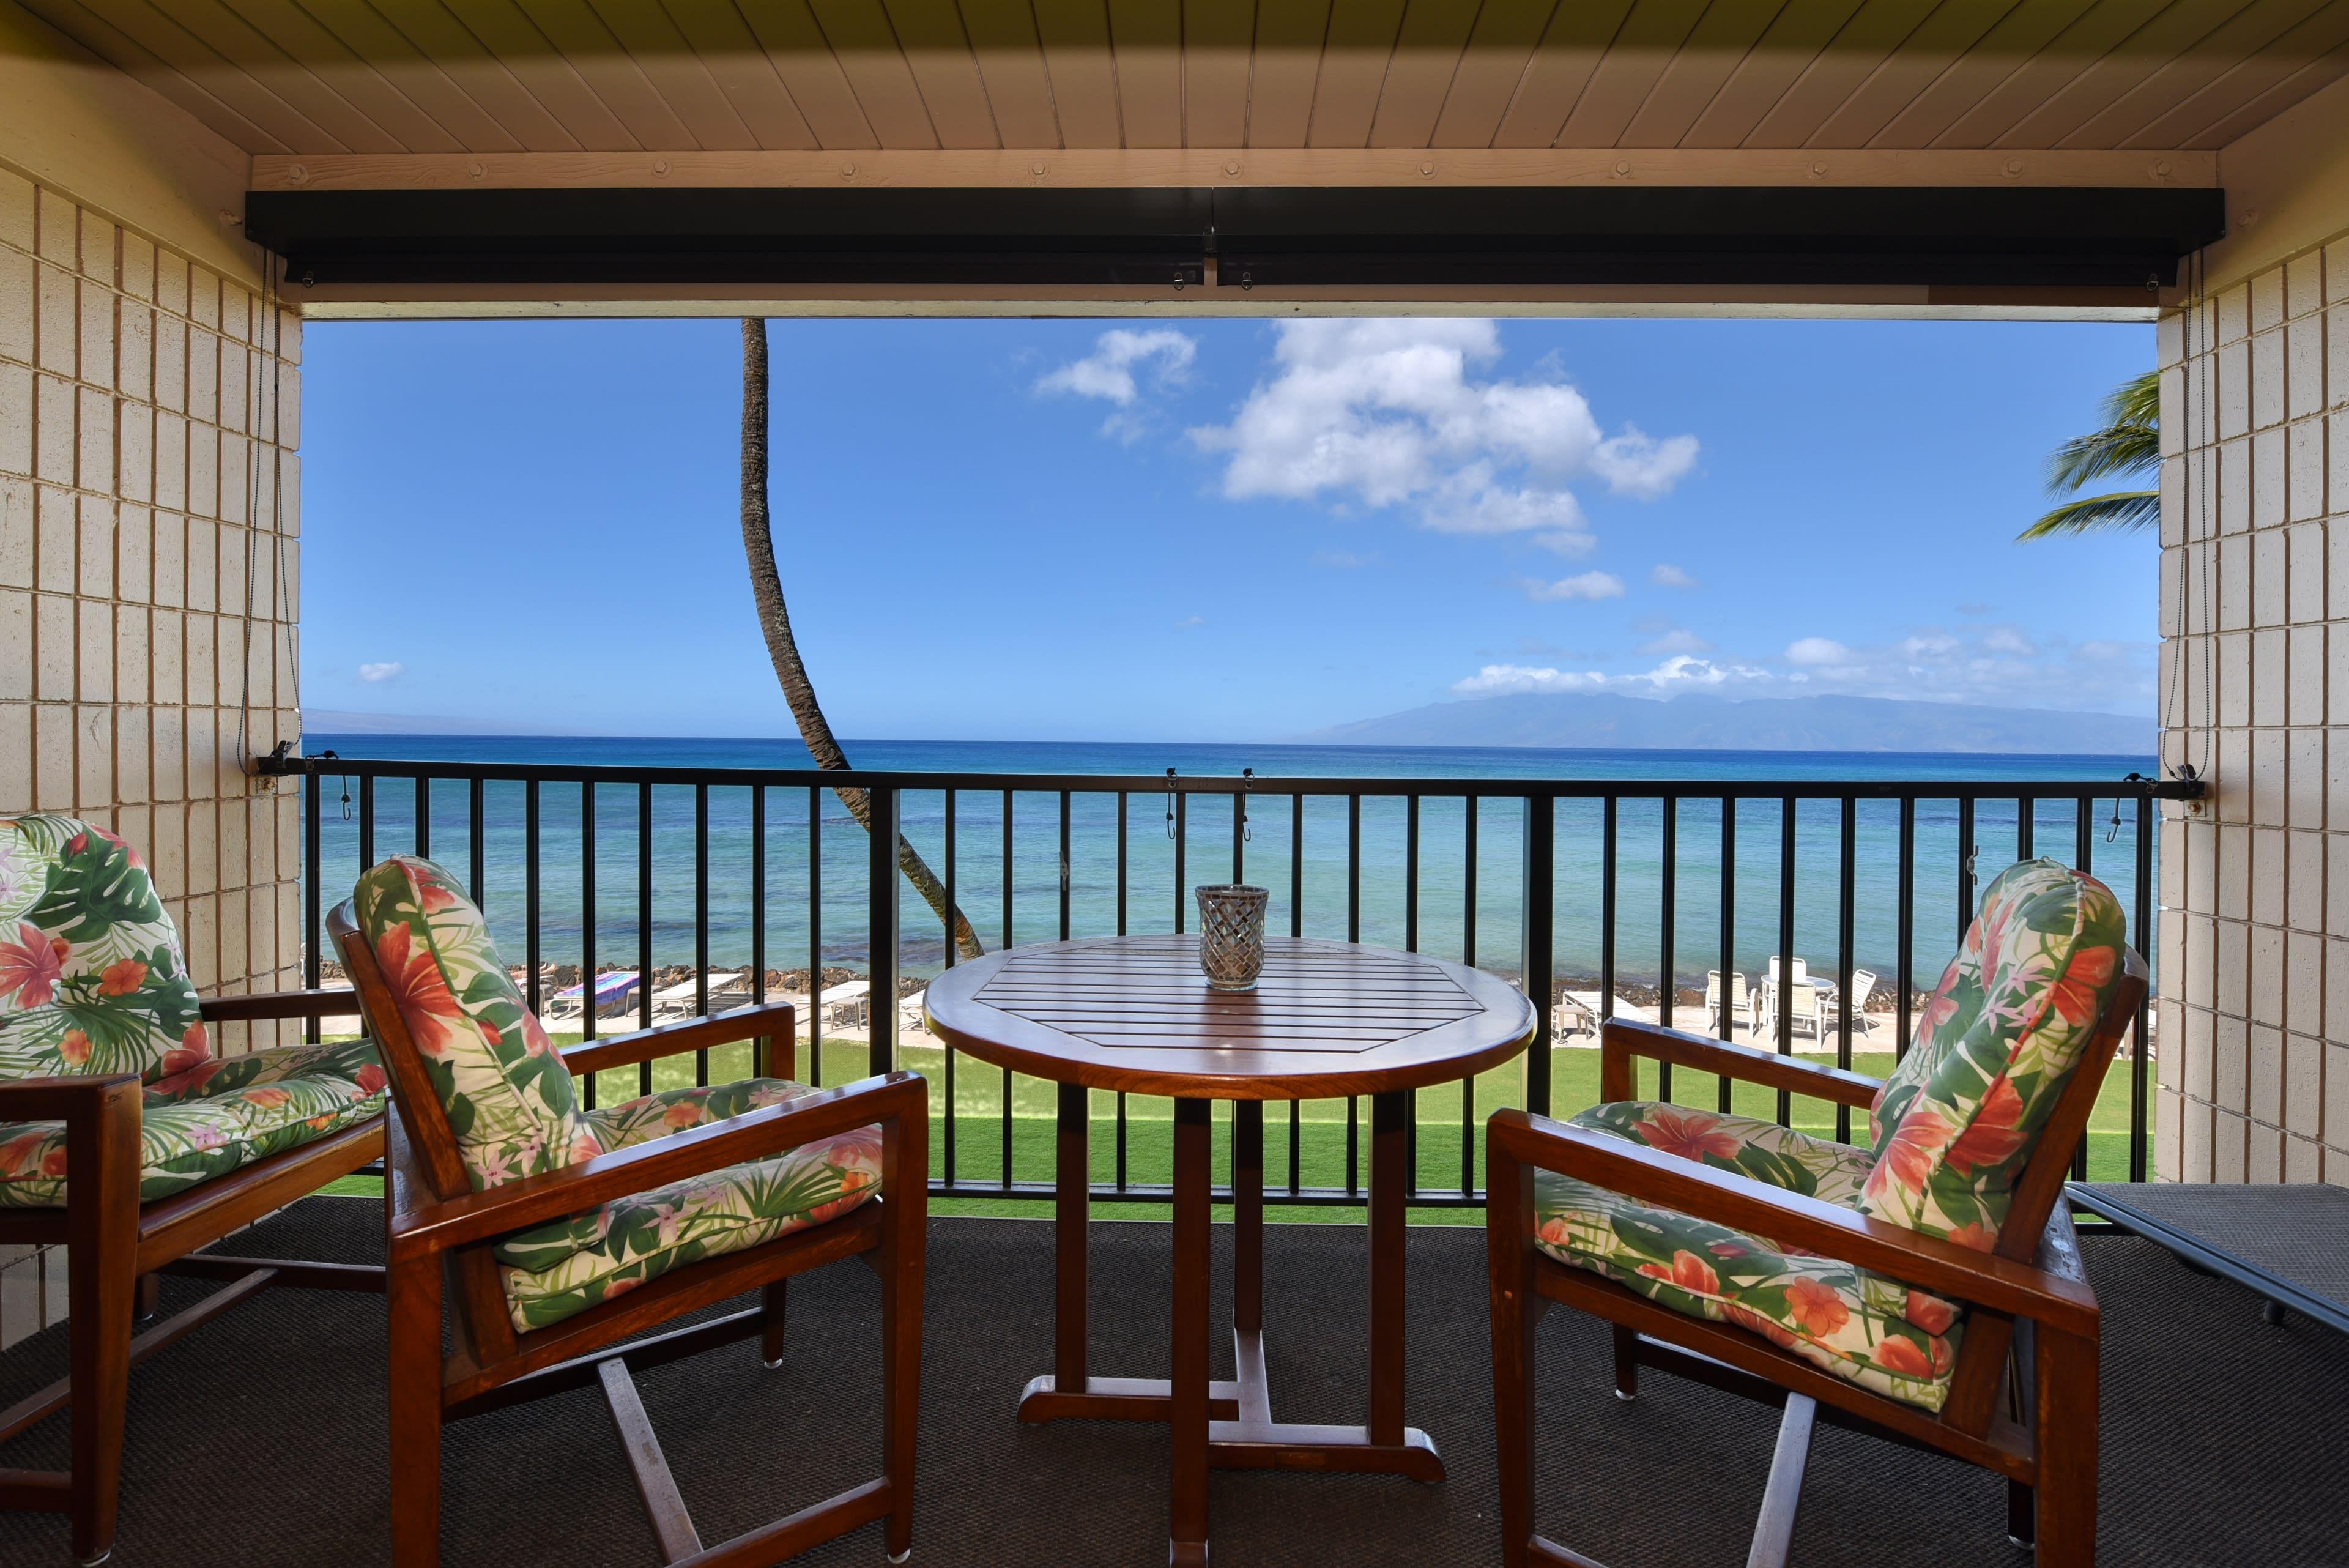 Lahaina Vacation Rental Condo   1BR   1BA   4th Floor   600 Sq Ft   2 Guests